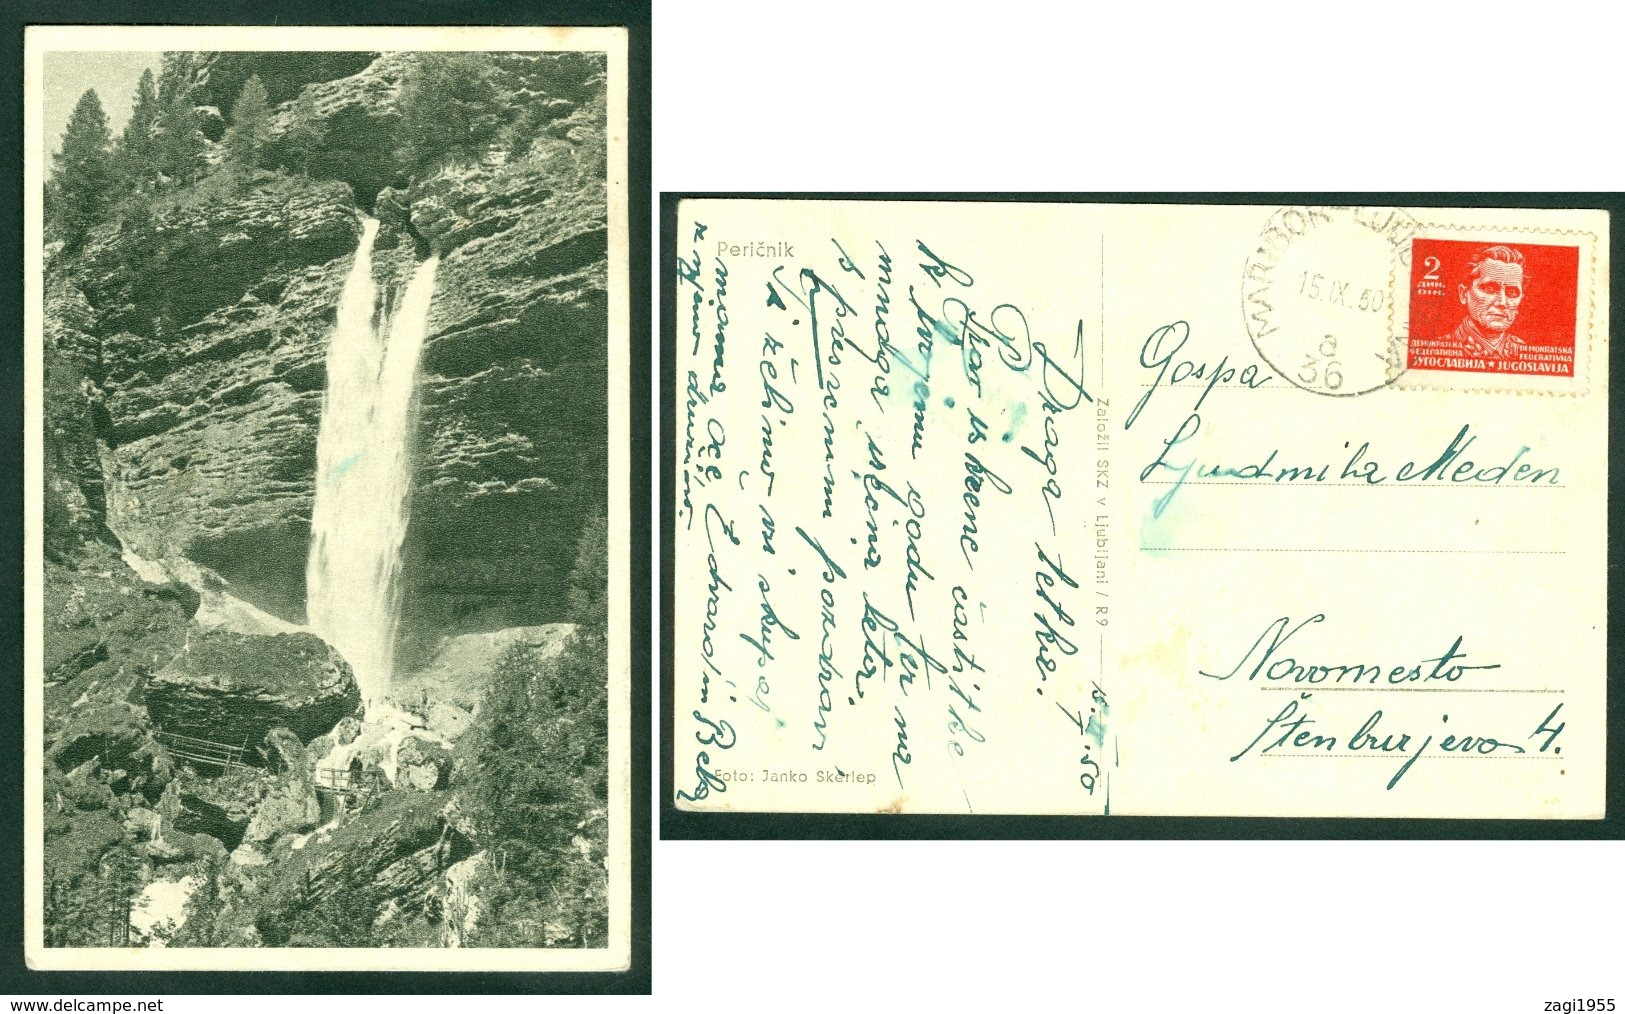 Yugoslavia 1950 Bahnpost Railway Mail Ambulance Post Maribor - Ljubljana 36 'a' Pericnik Waterfall Postcard Letter - 1945-1992 Socialist Federal Republic Of Yugoslavia